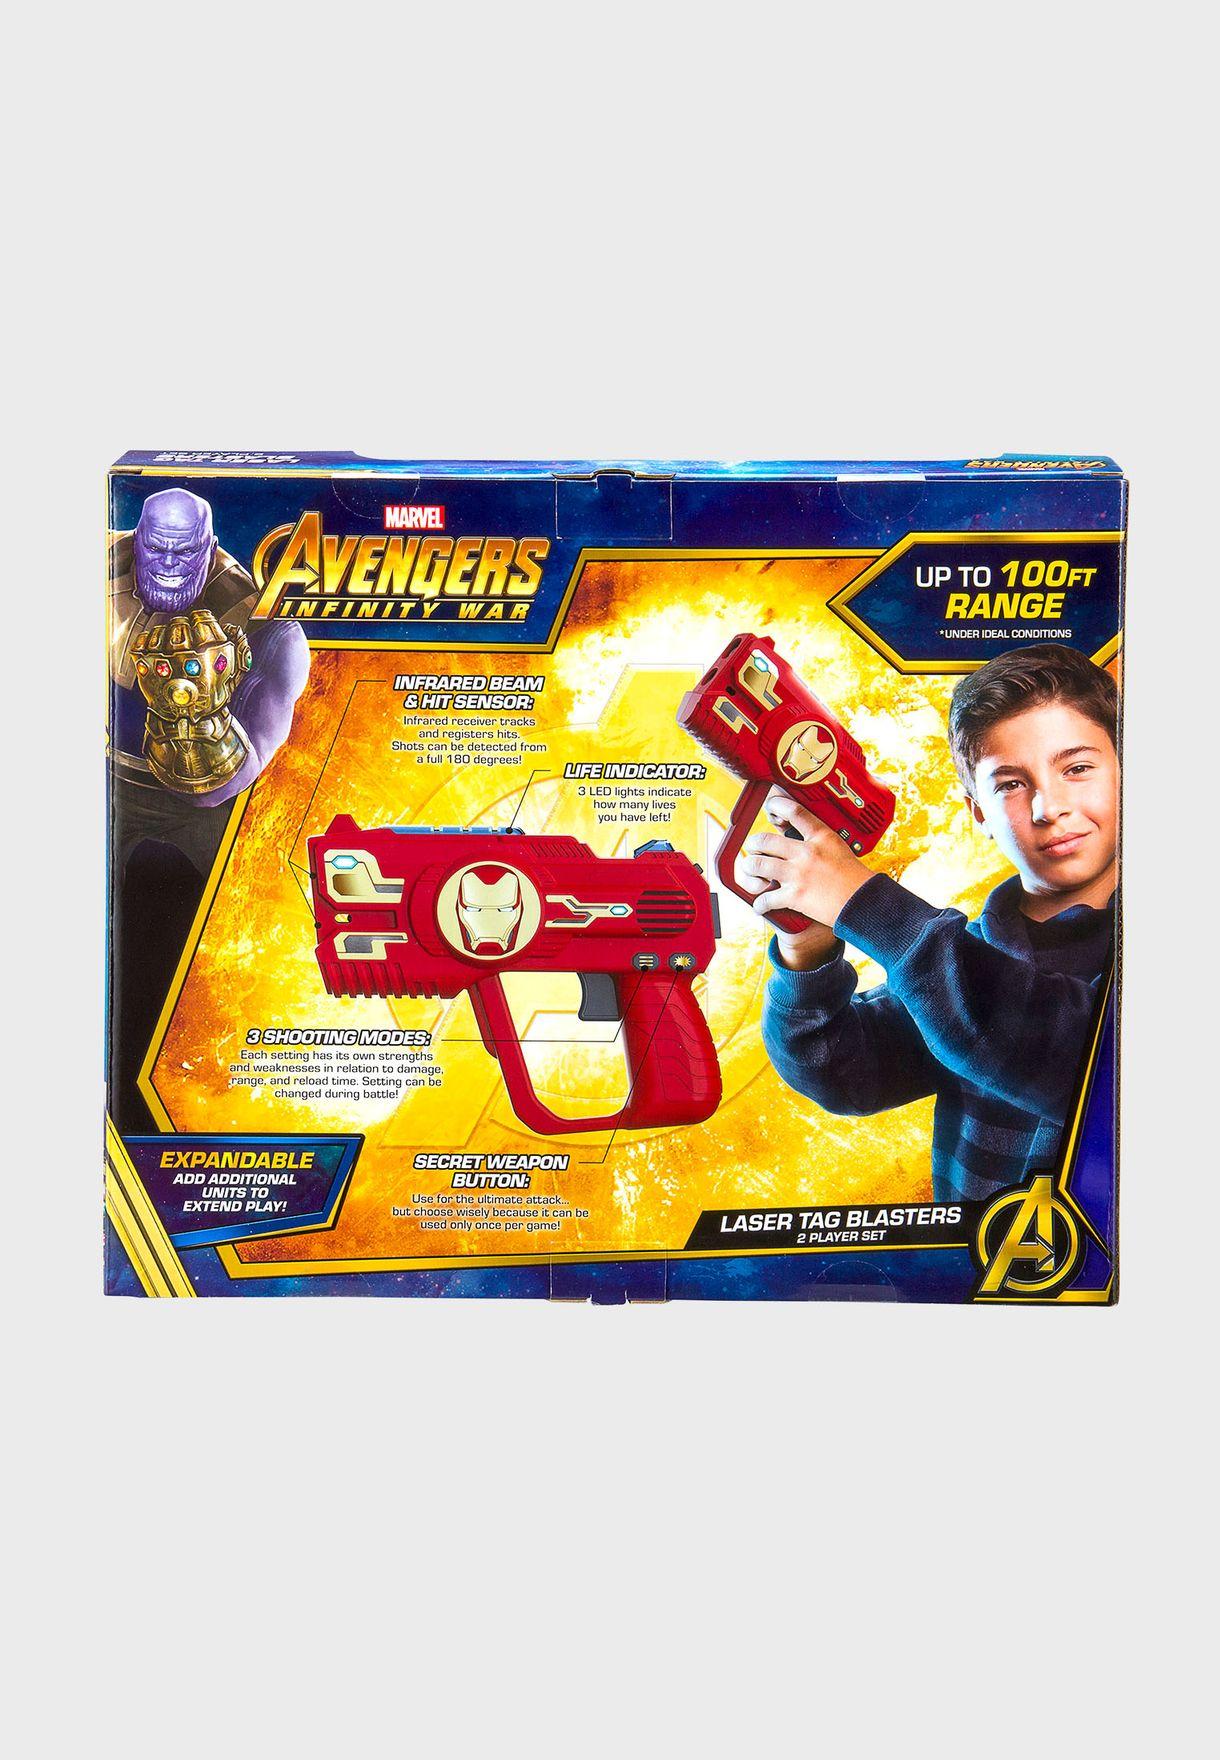 Avengers Laser Tag Blasters